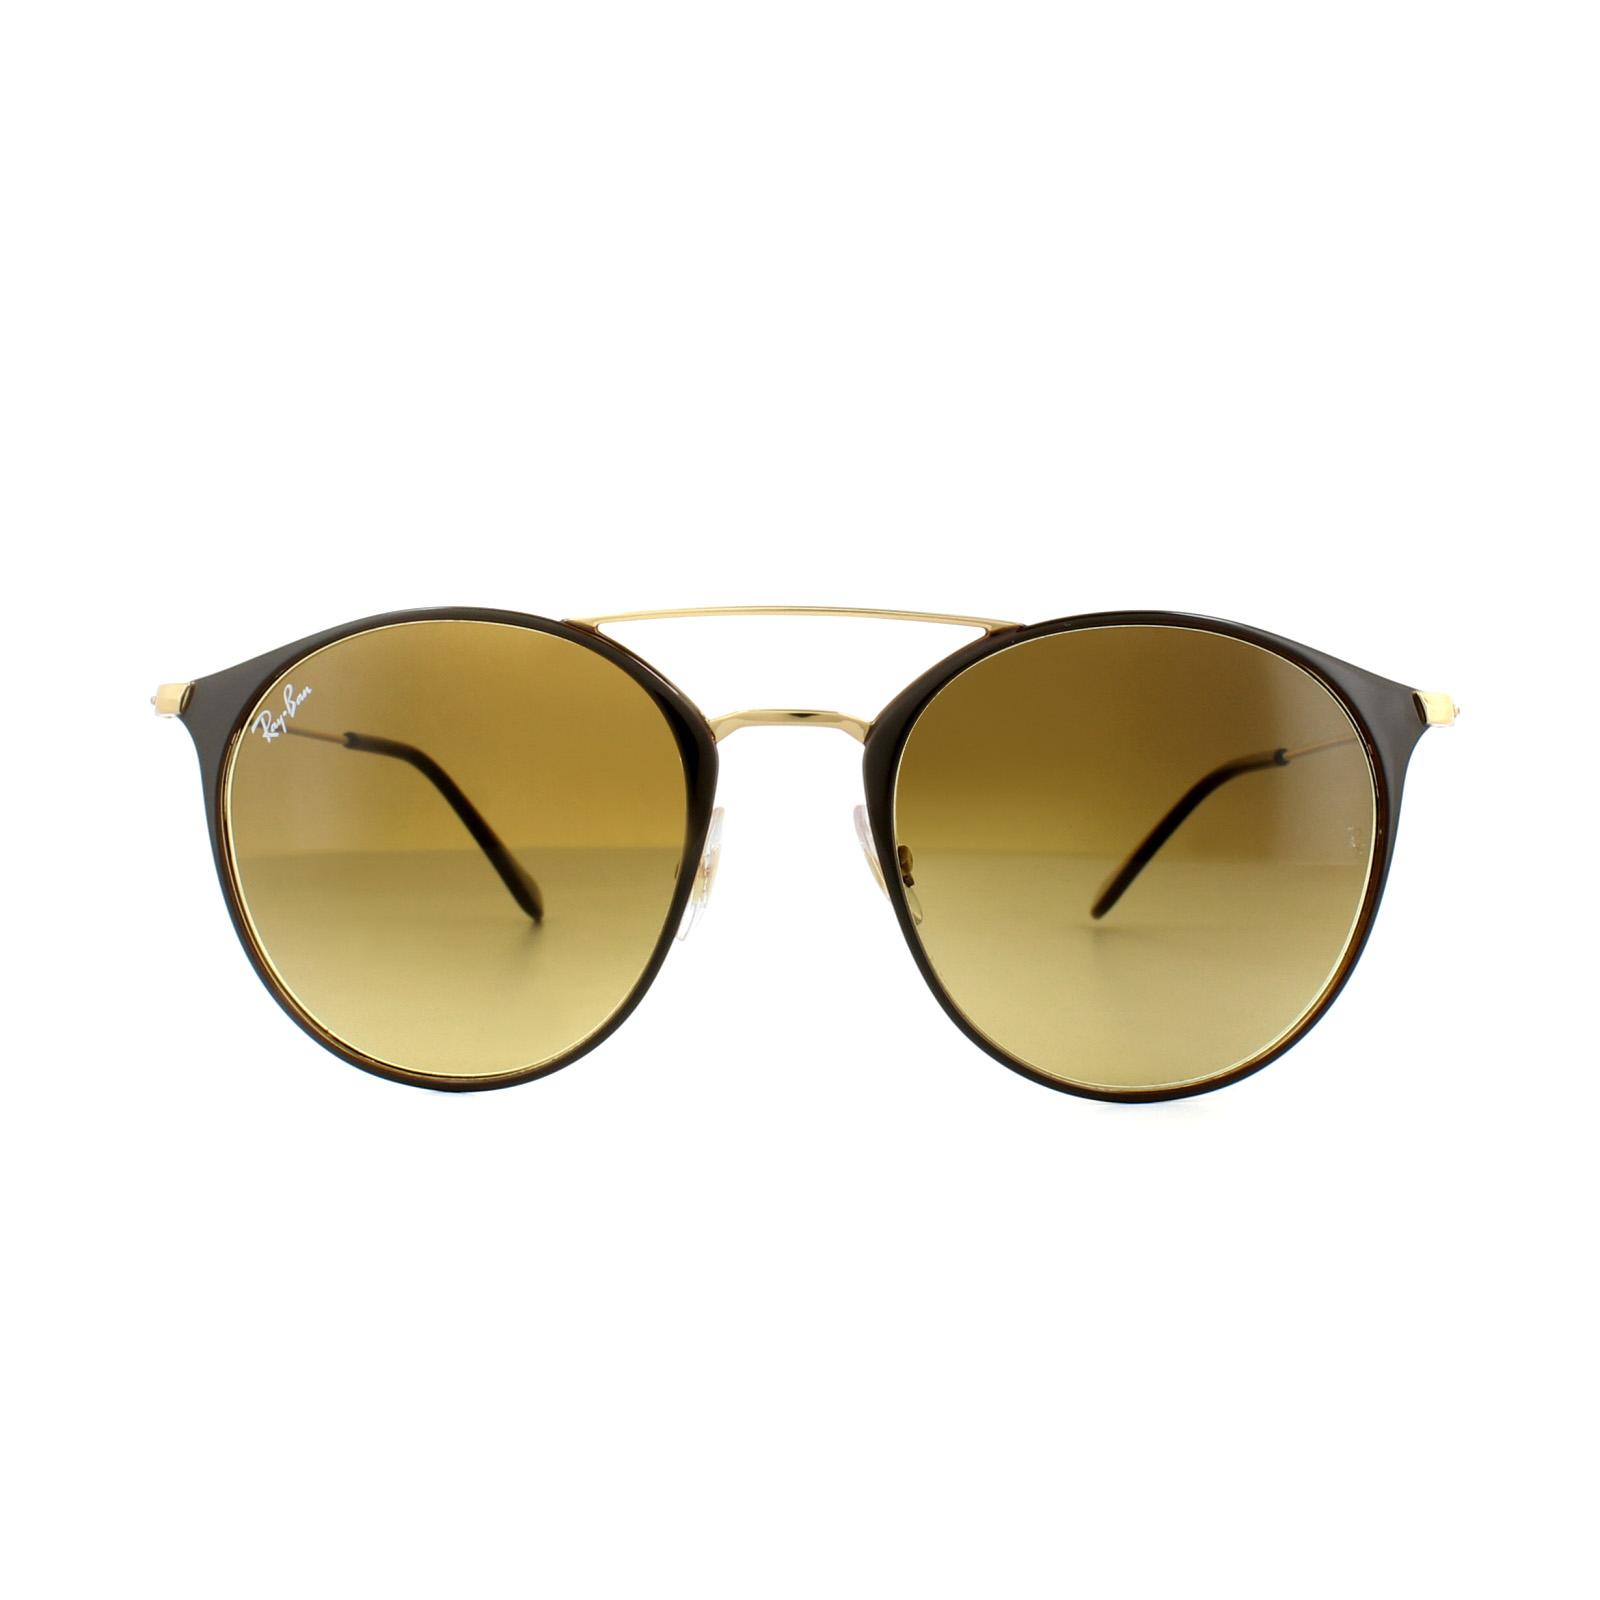 1c98d790da Sentinel Ray-Ban Sunglasses 3546 900985 Brown Gold Brown Gradient. Sentinel  Thumbnail 2